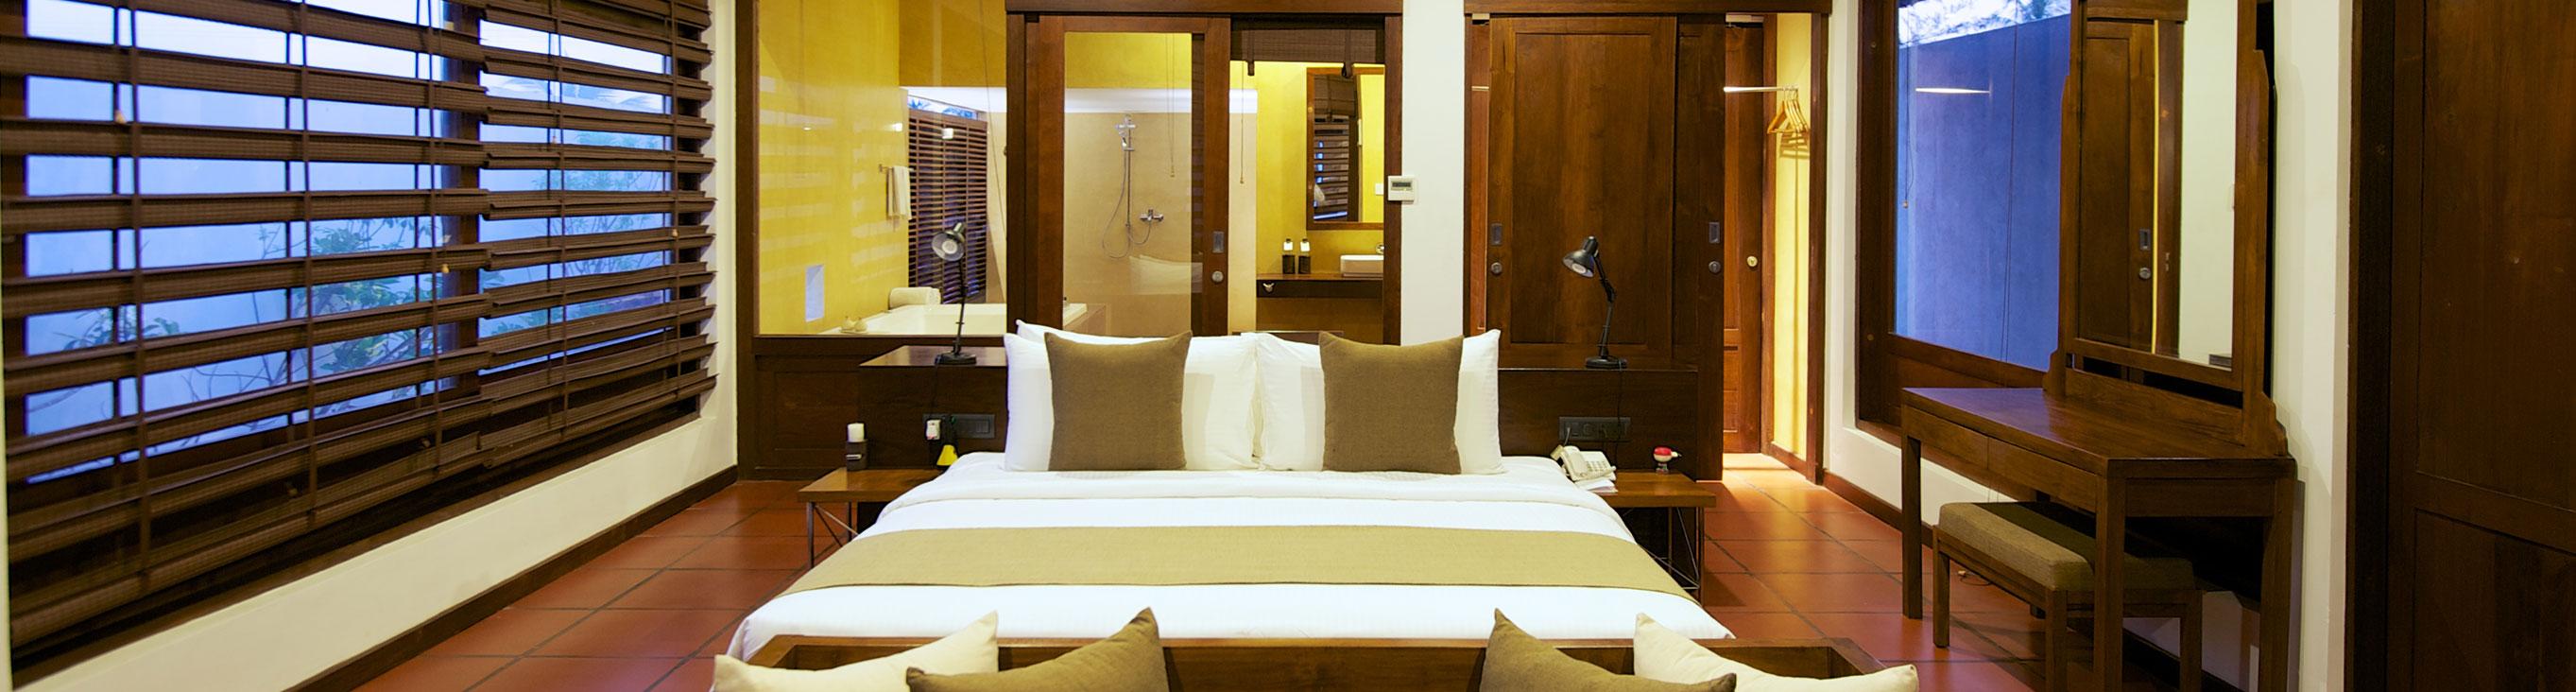 luxury accommodation at the villa